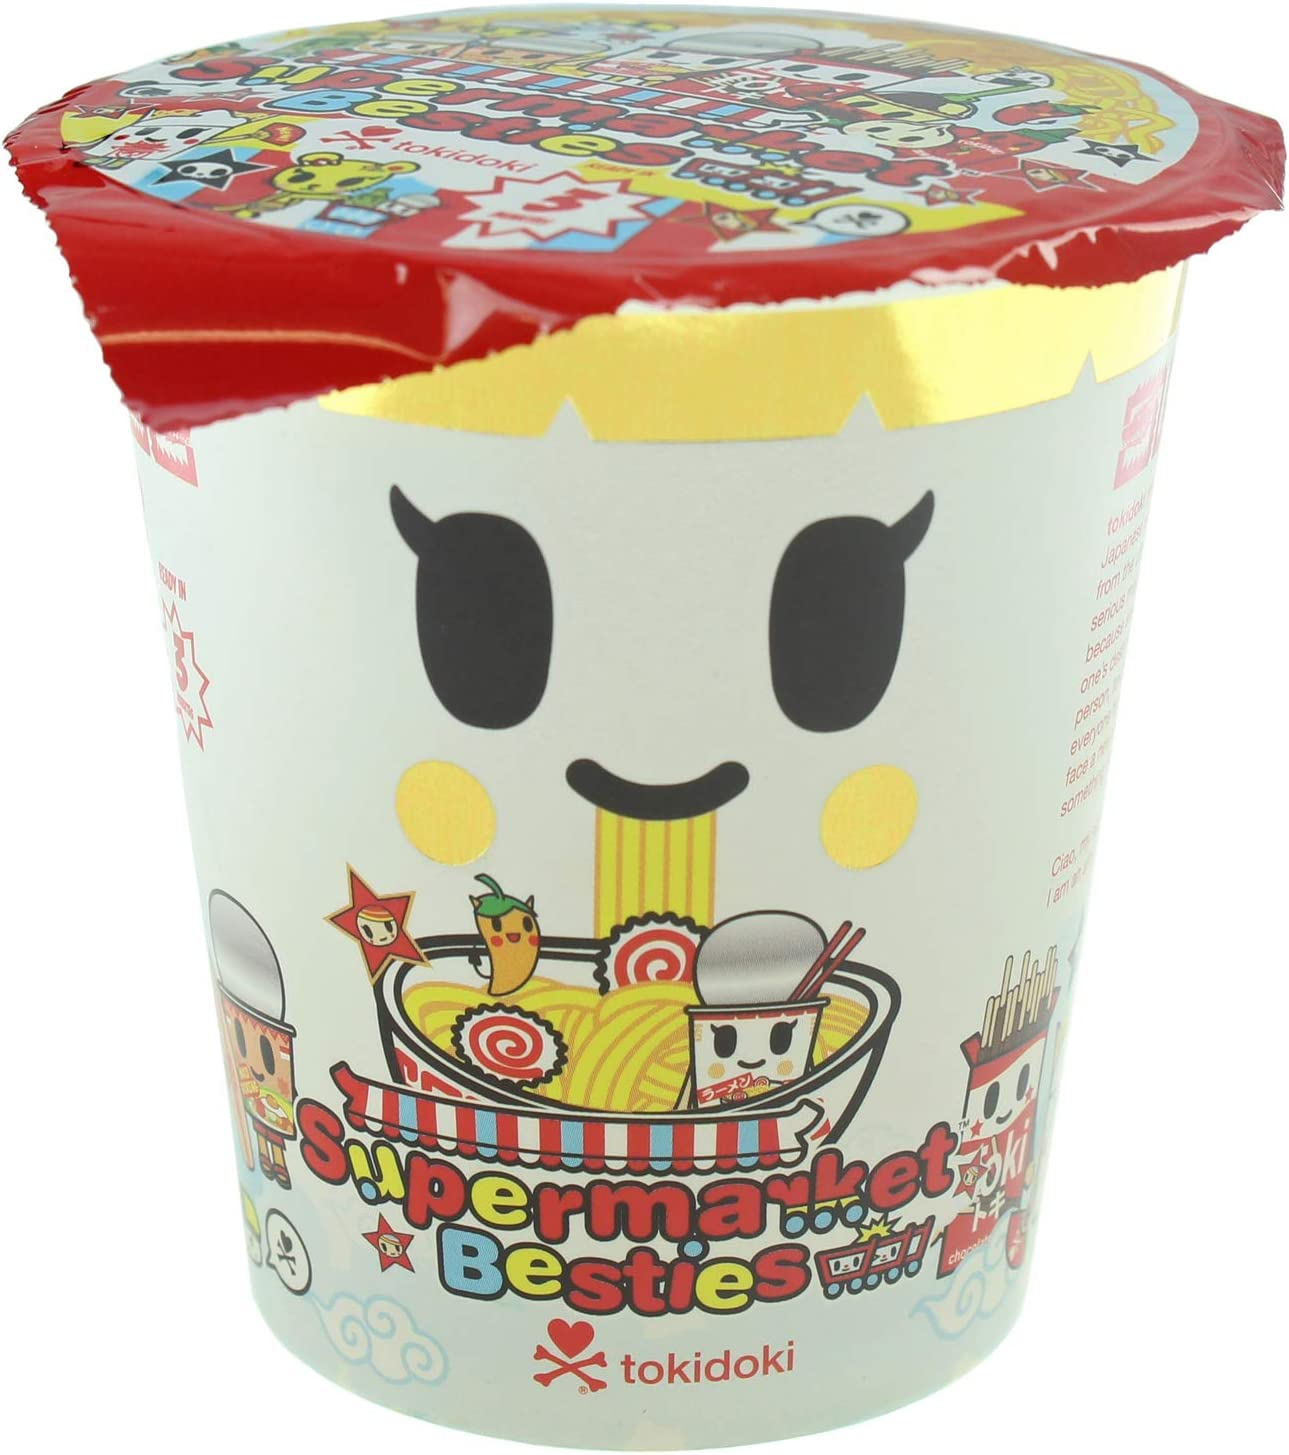 "Tokidoki Supermarket Besties Hotty Chaser 3/"" Mini Vinyl Figure Blind Box Toy"